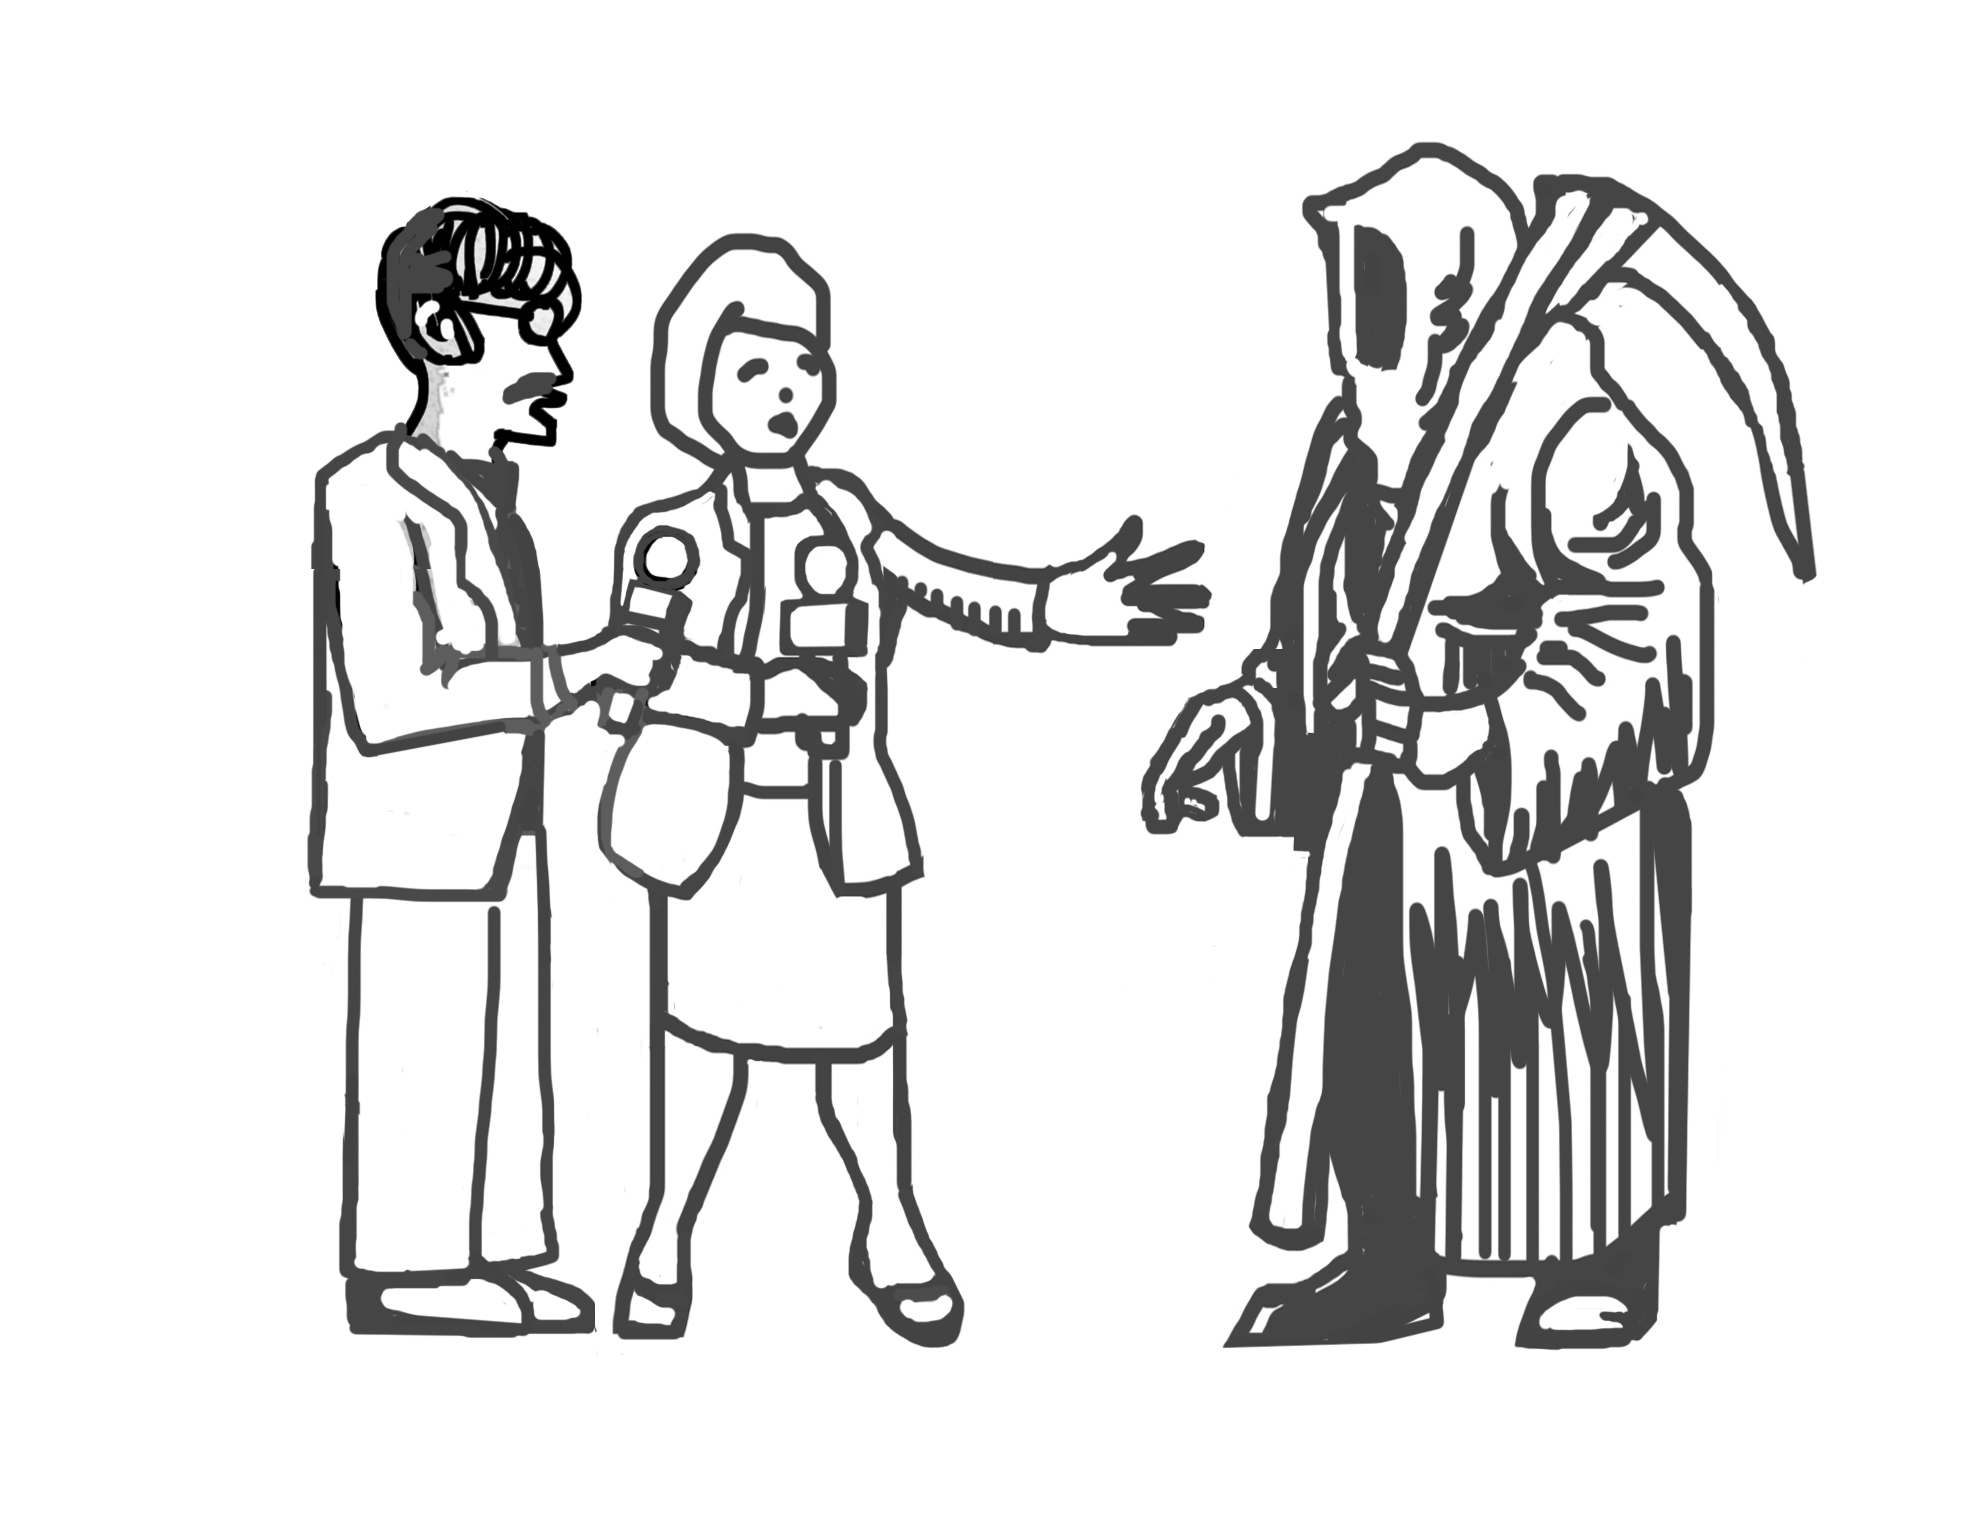 Interview with Death, cartoon by Ed McKean, 2016